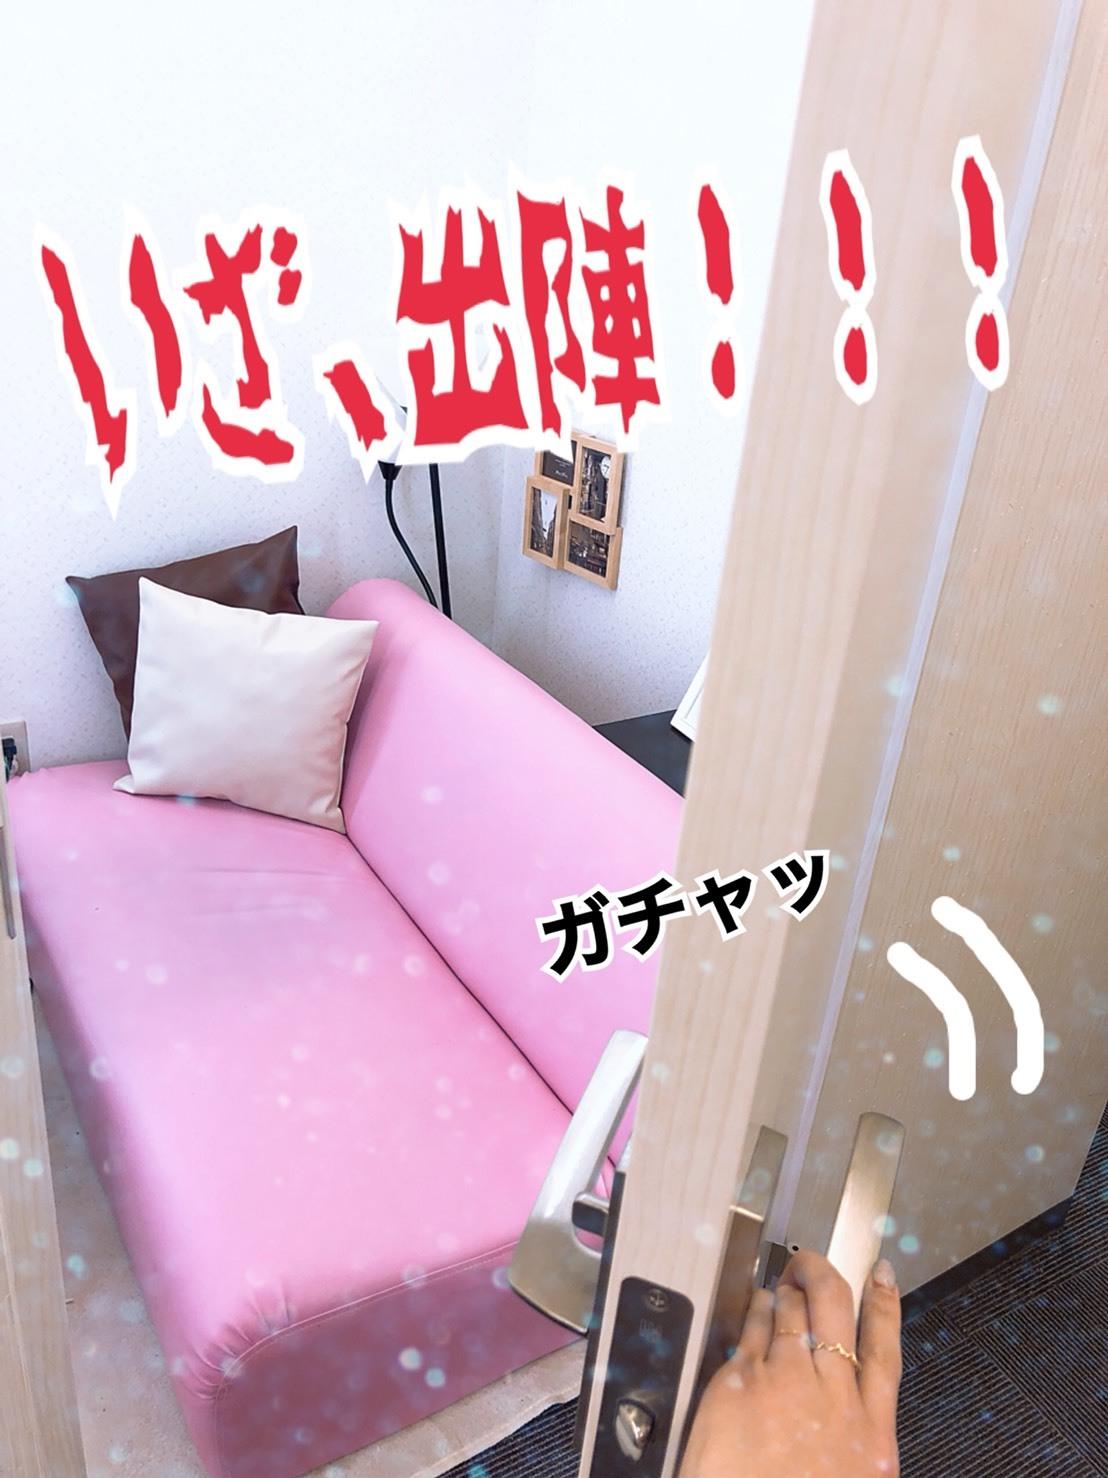 S__16474132.jpg